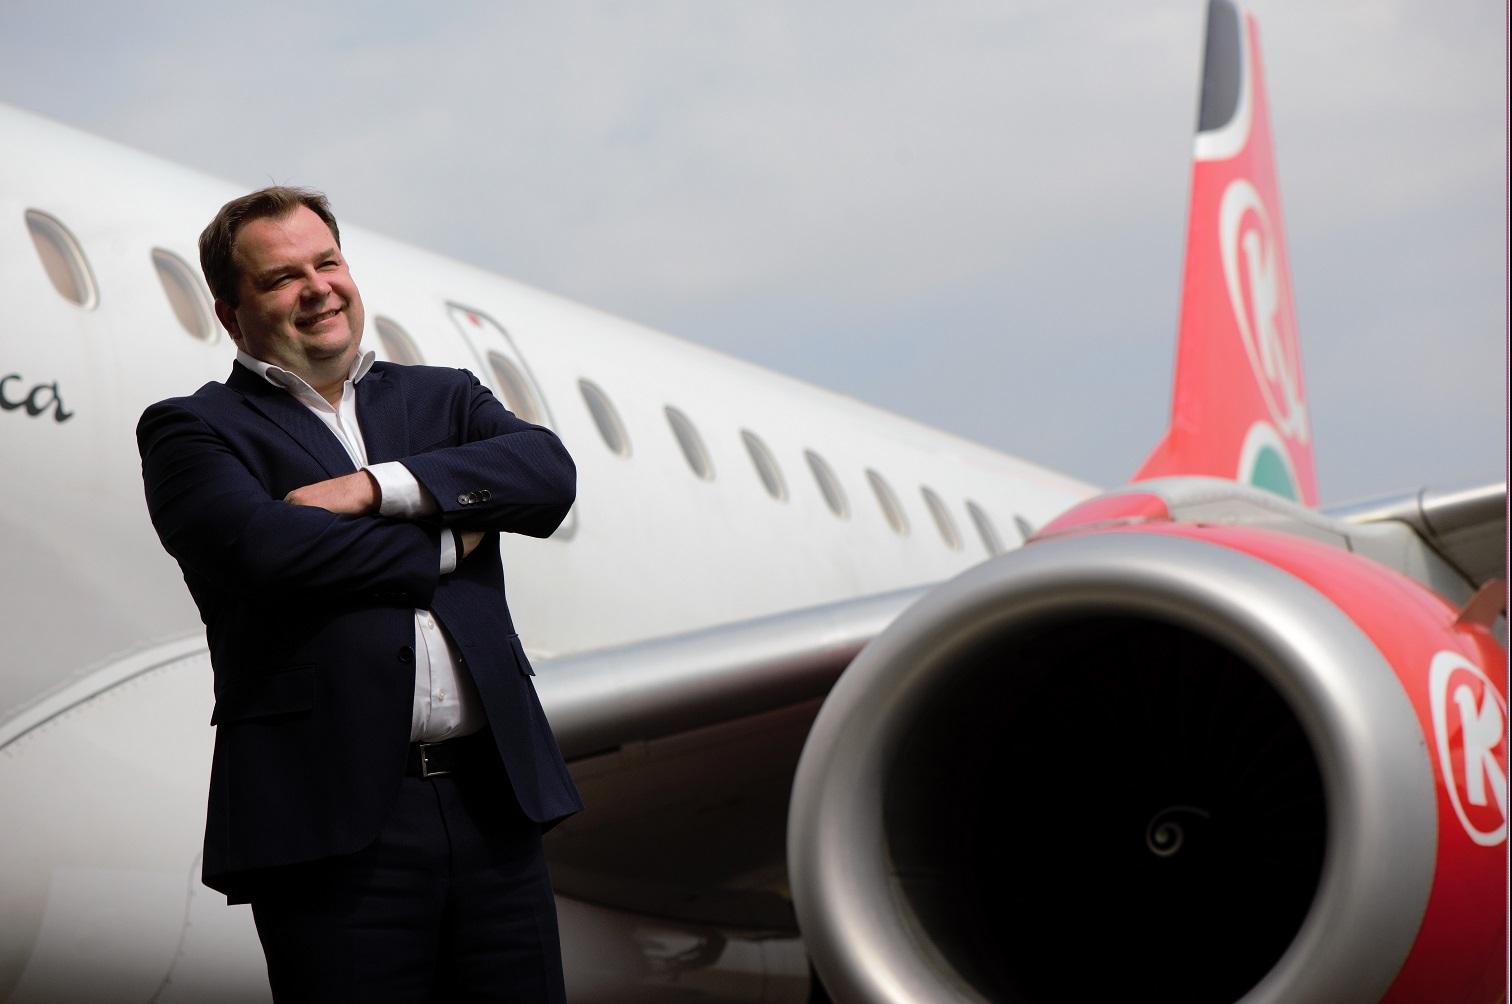 Kenya Airways Klm Ink An Extended Sales Agreement Kenyan Collective